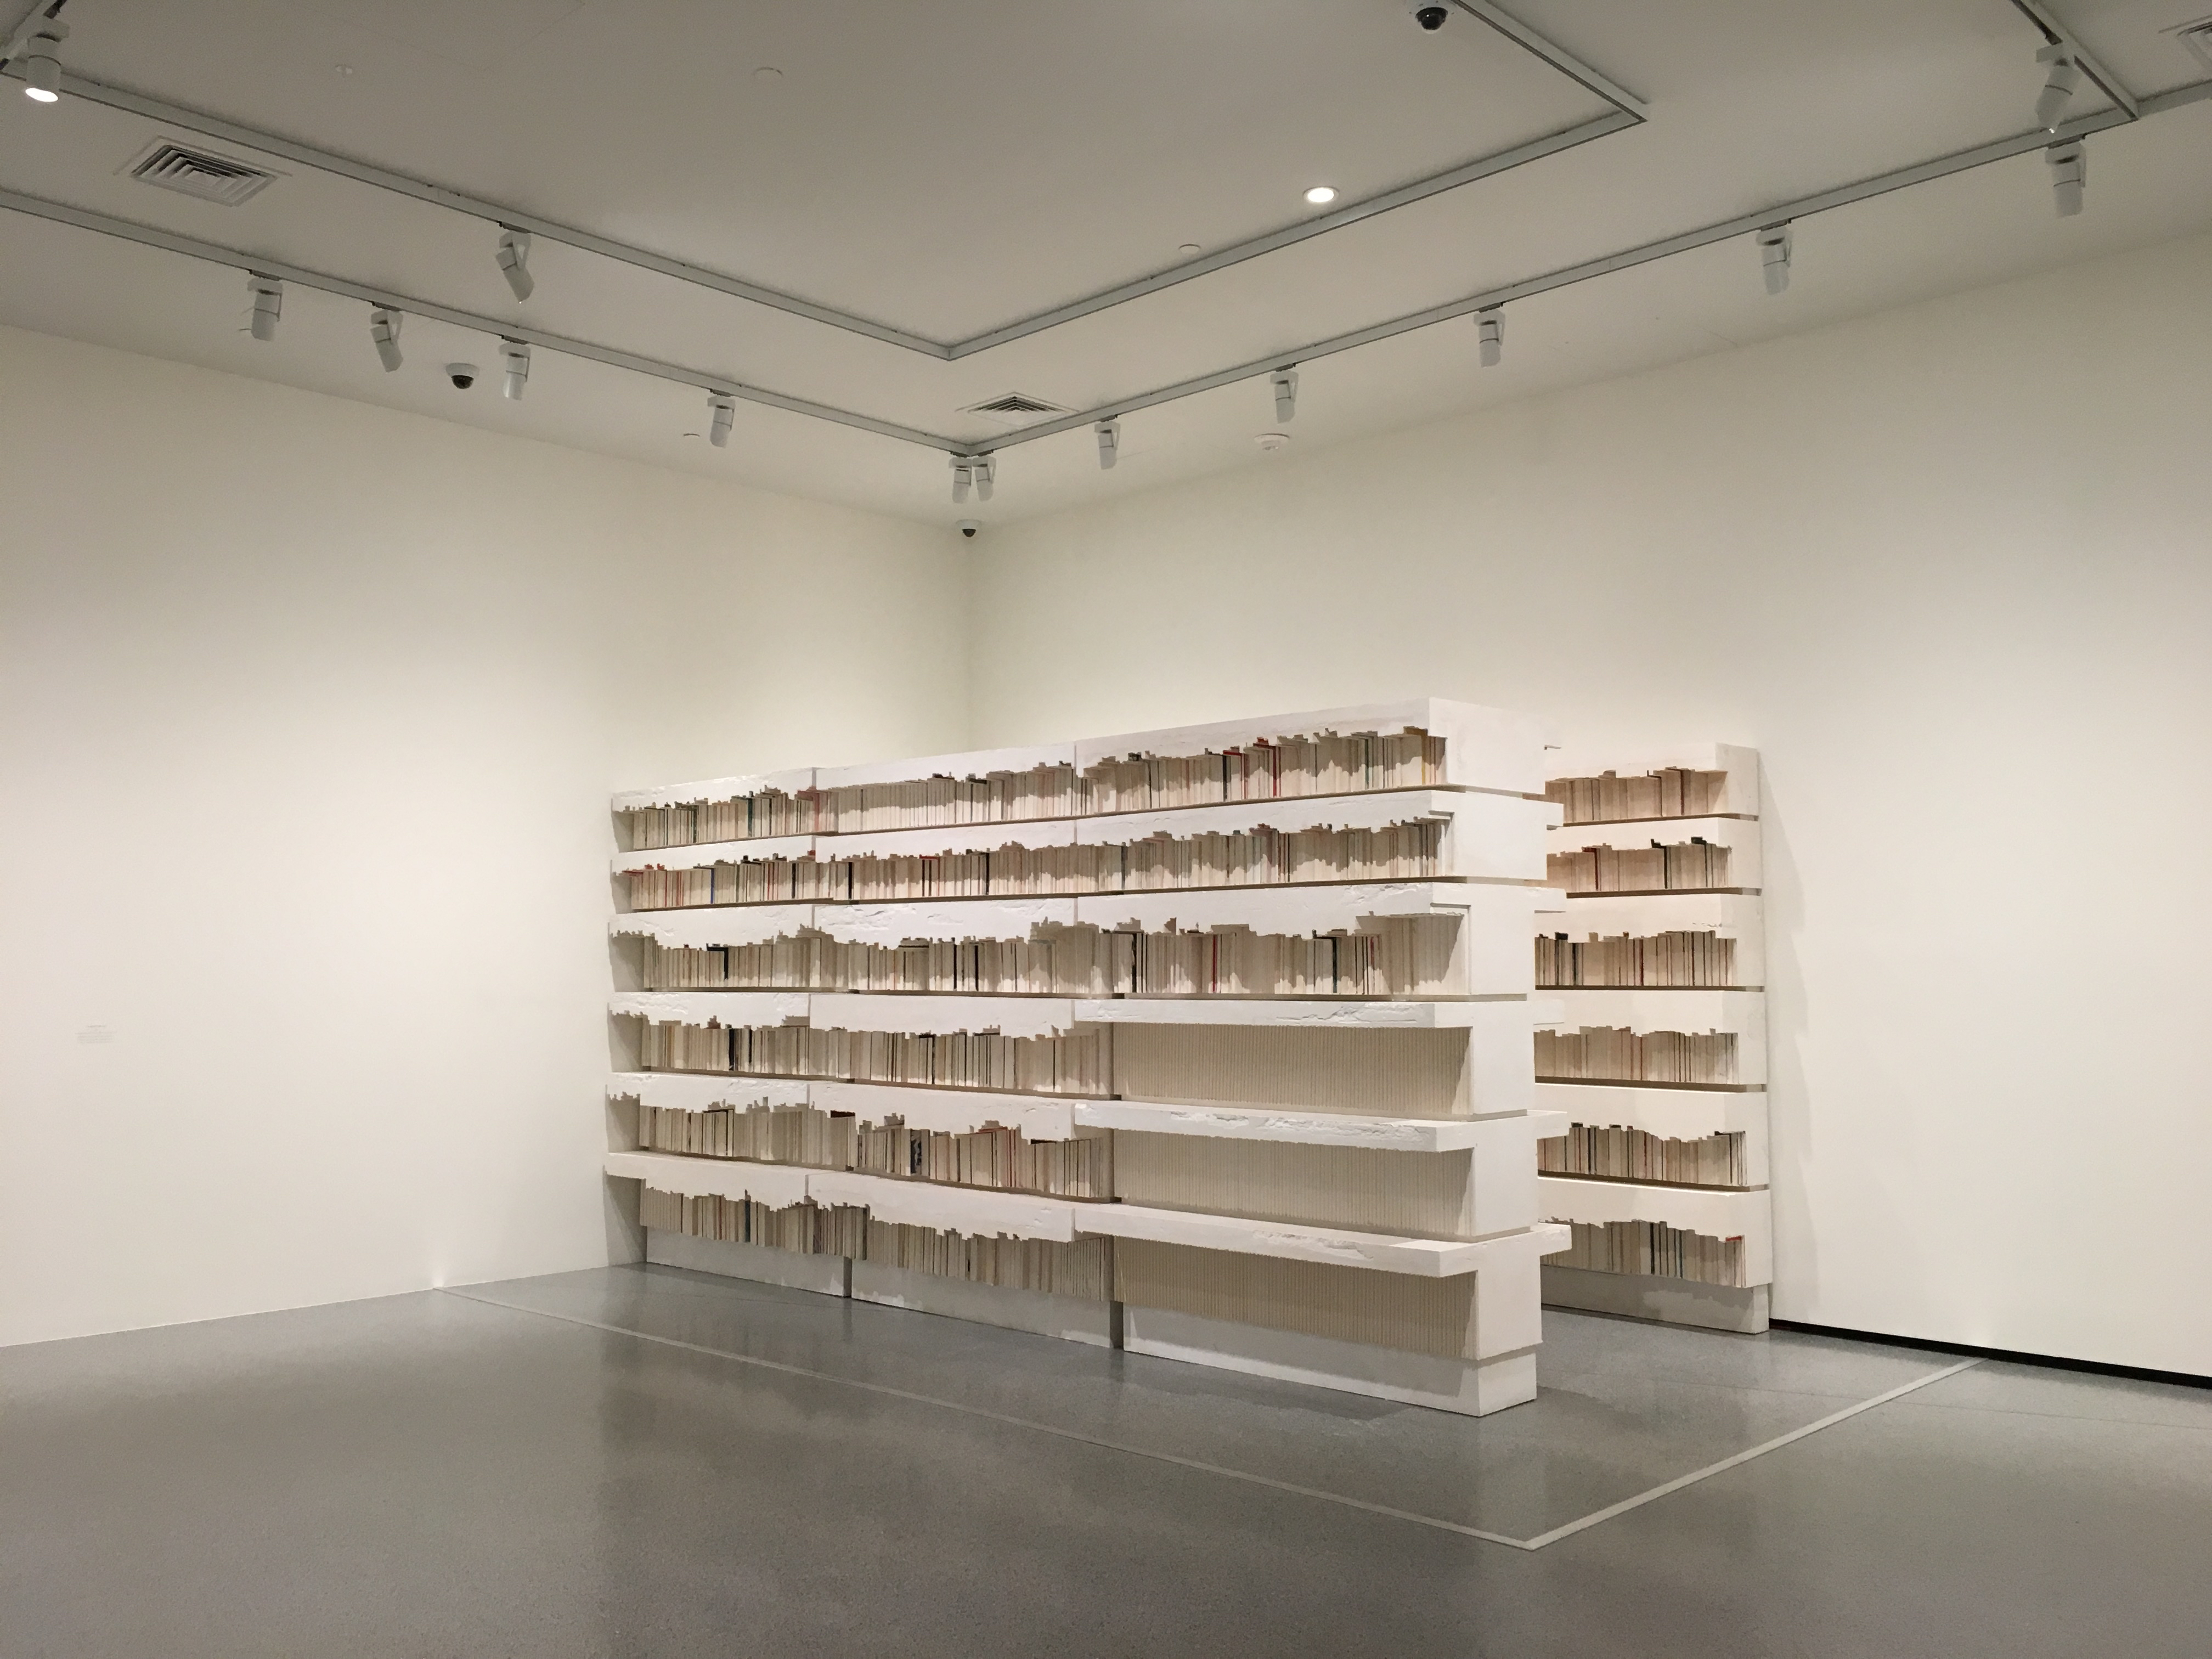 Untitled Library, 1999, Rachel Whiteread